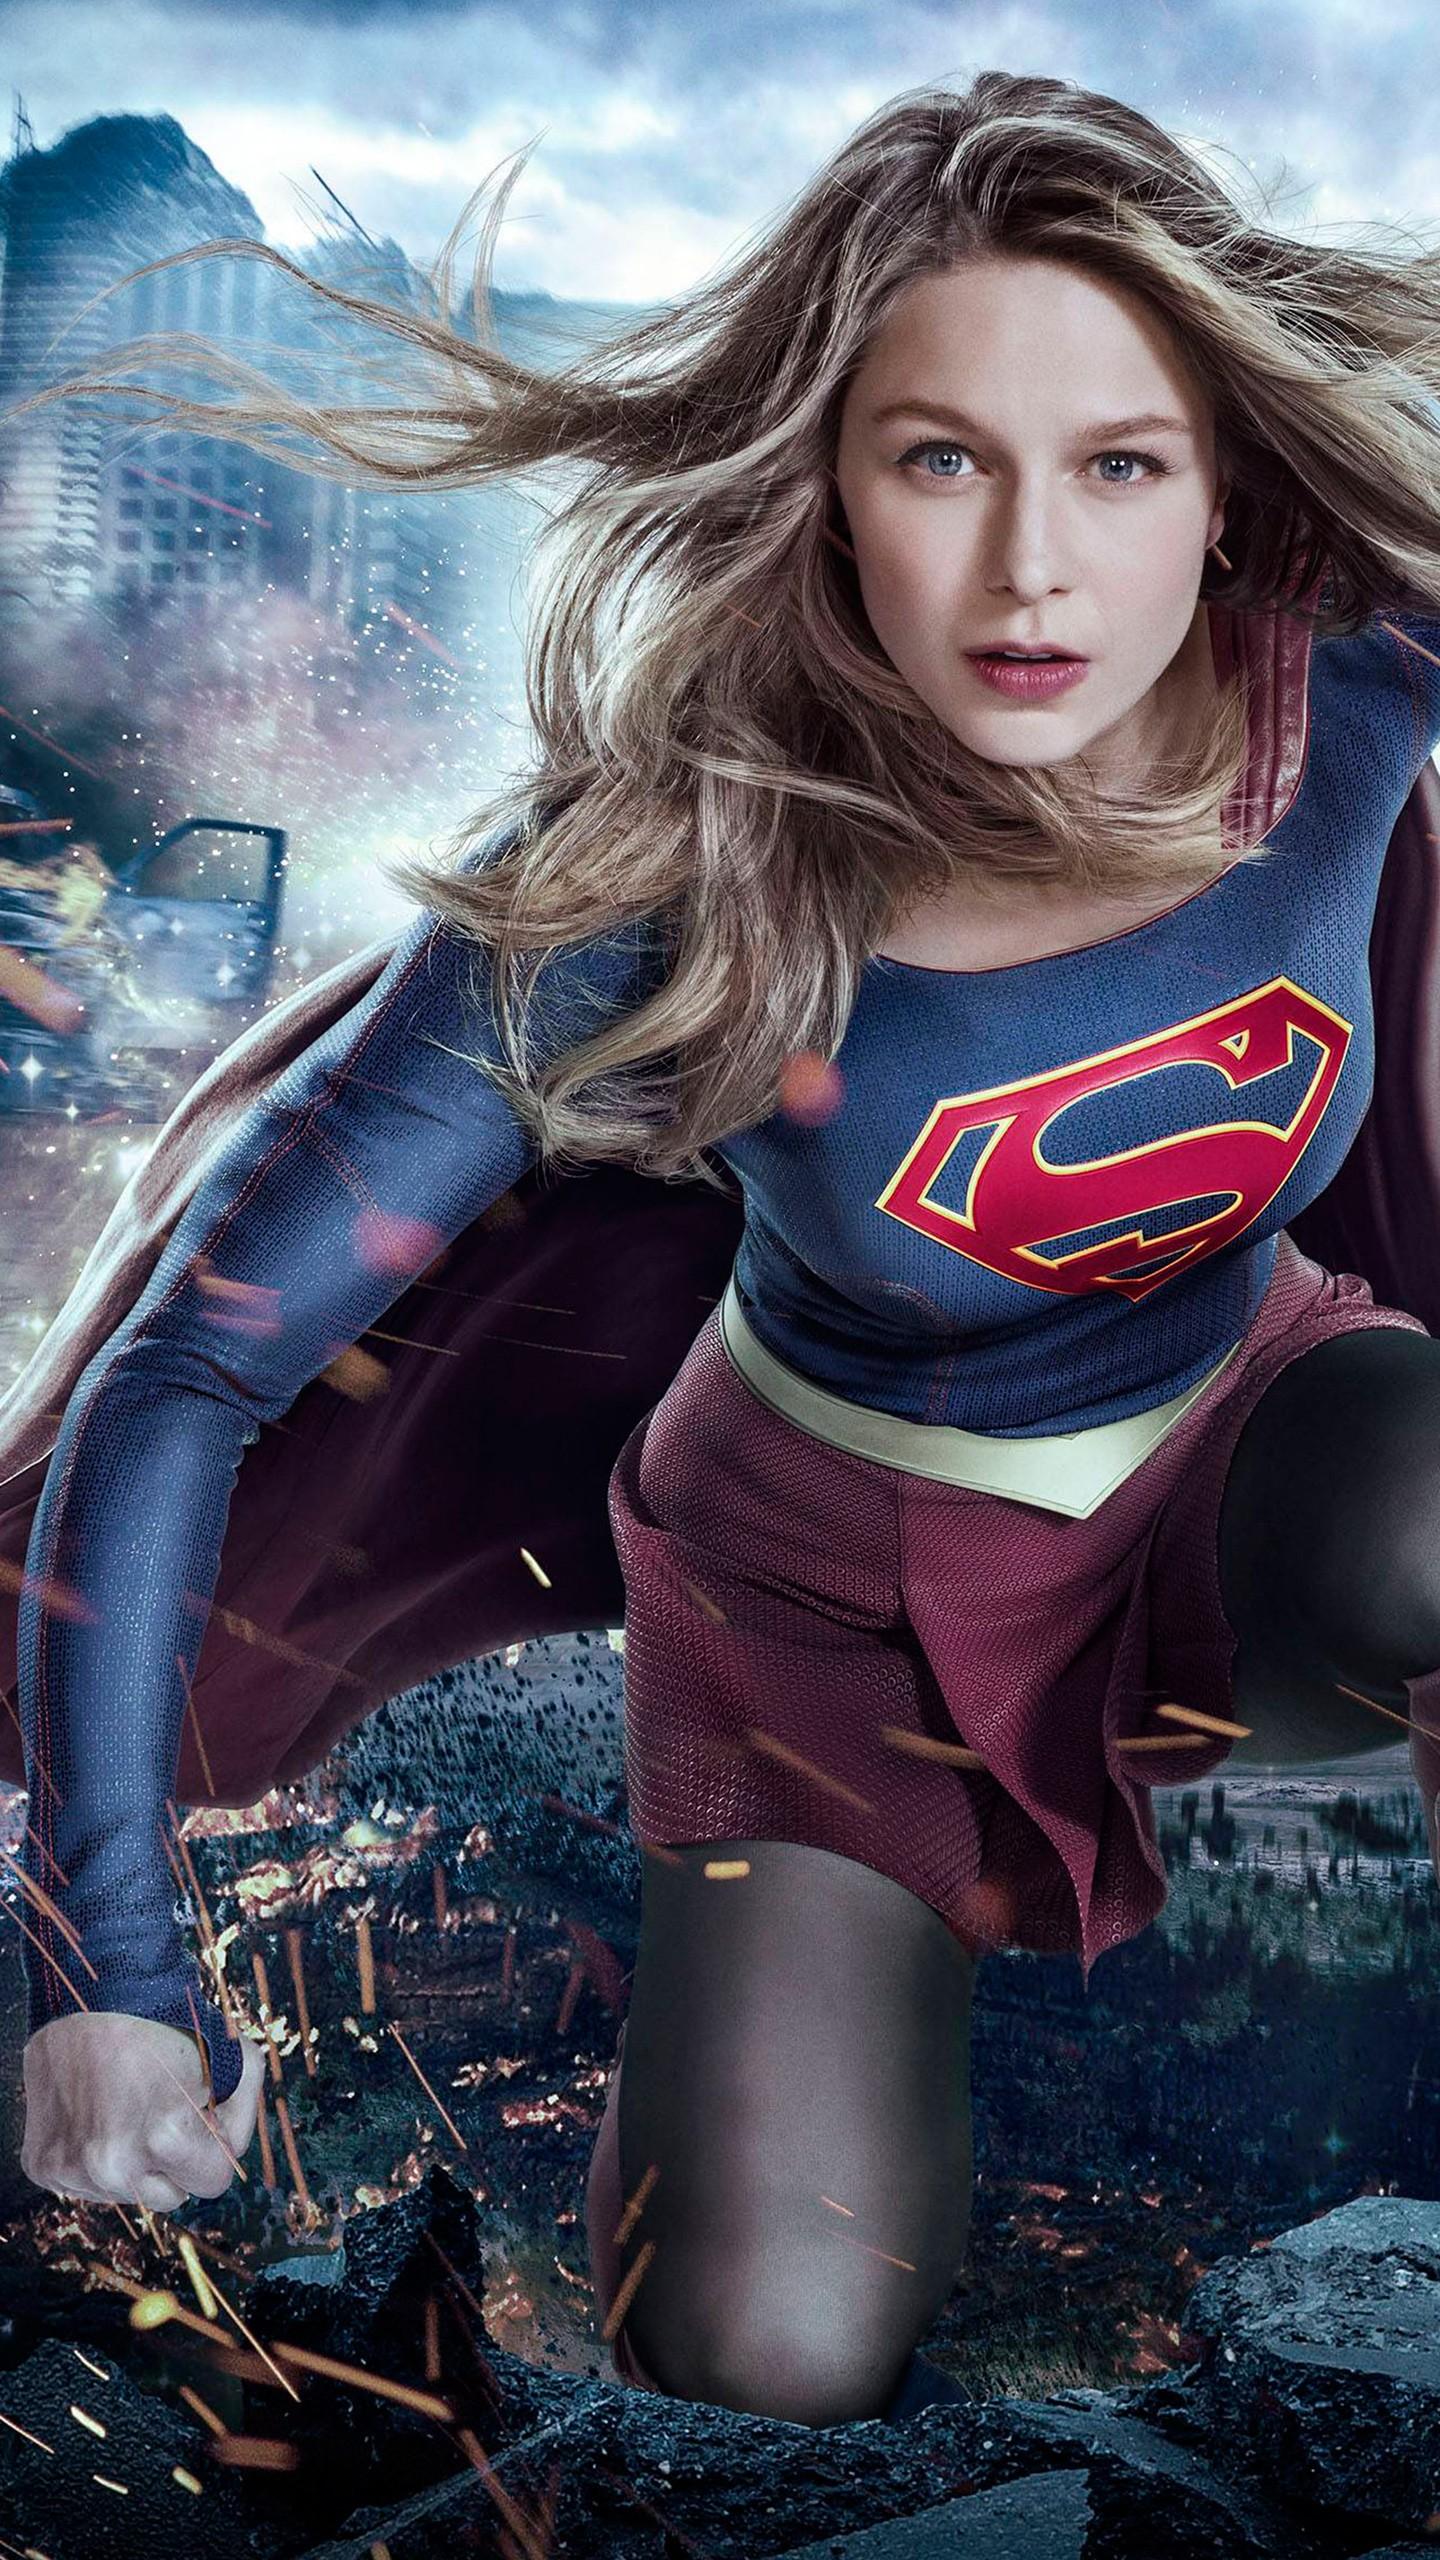 Ultra Hd Wallpapers 8k Girl Supergirl Melissa Benoist Season 3 2017 Wallpapers Hd